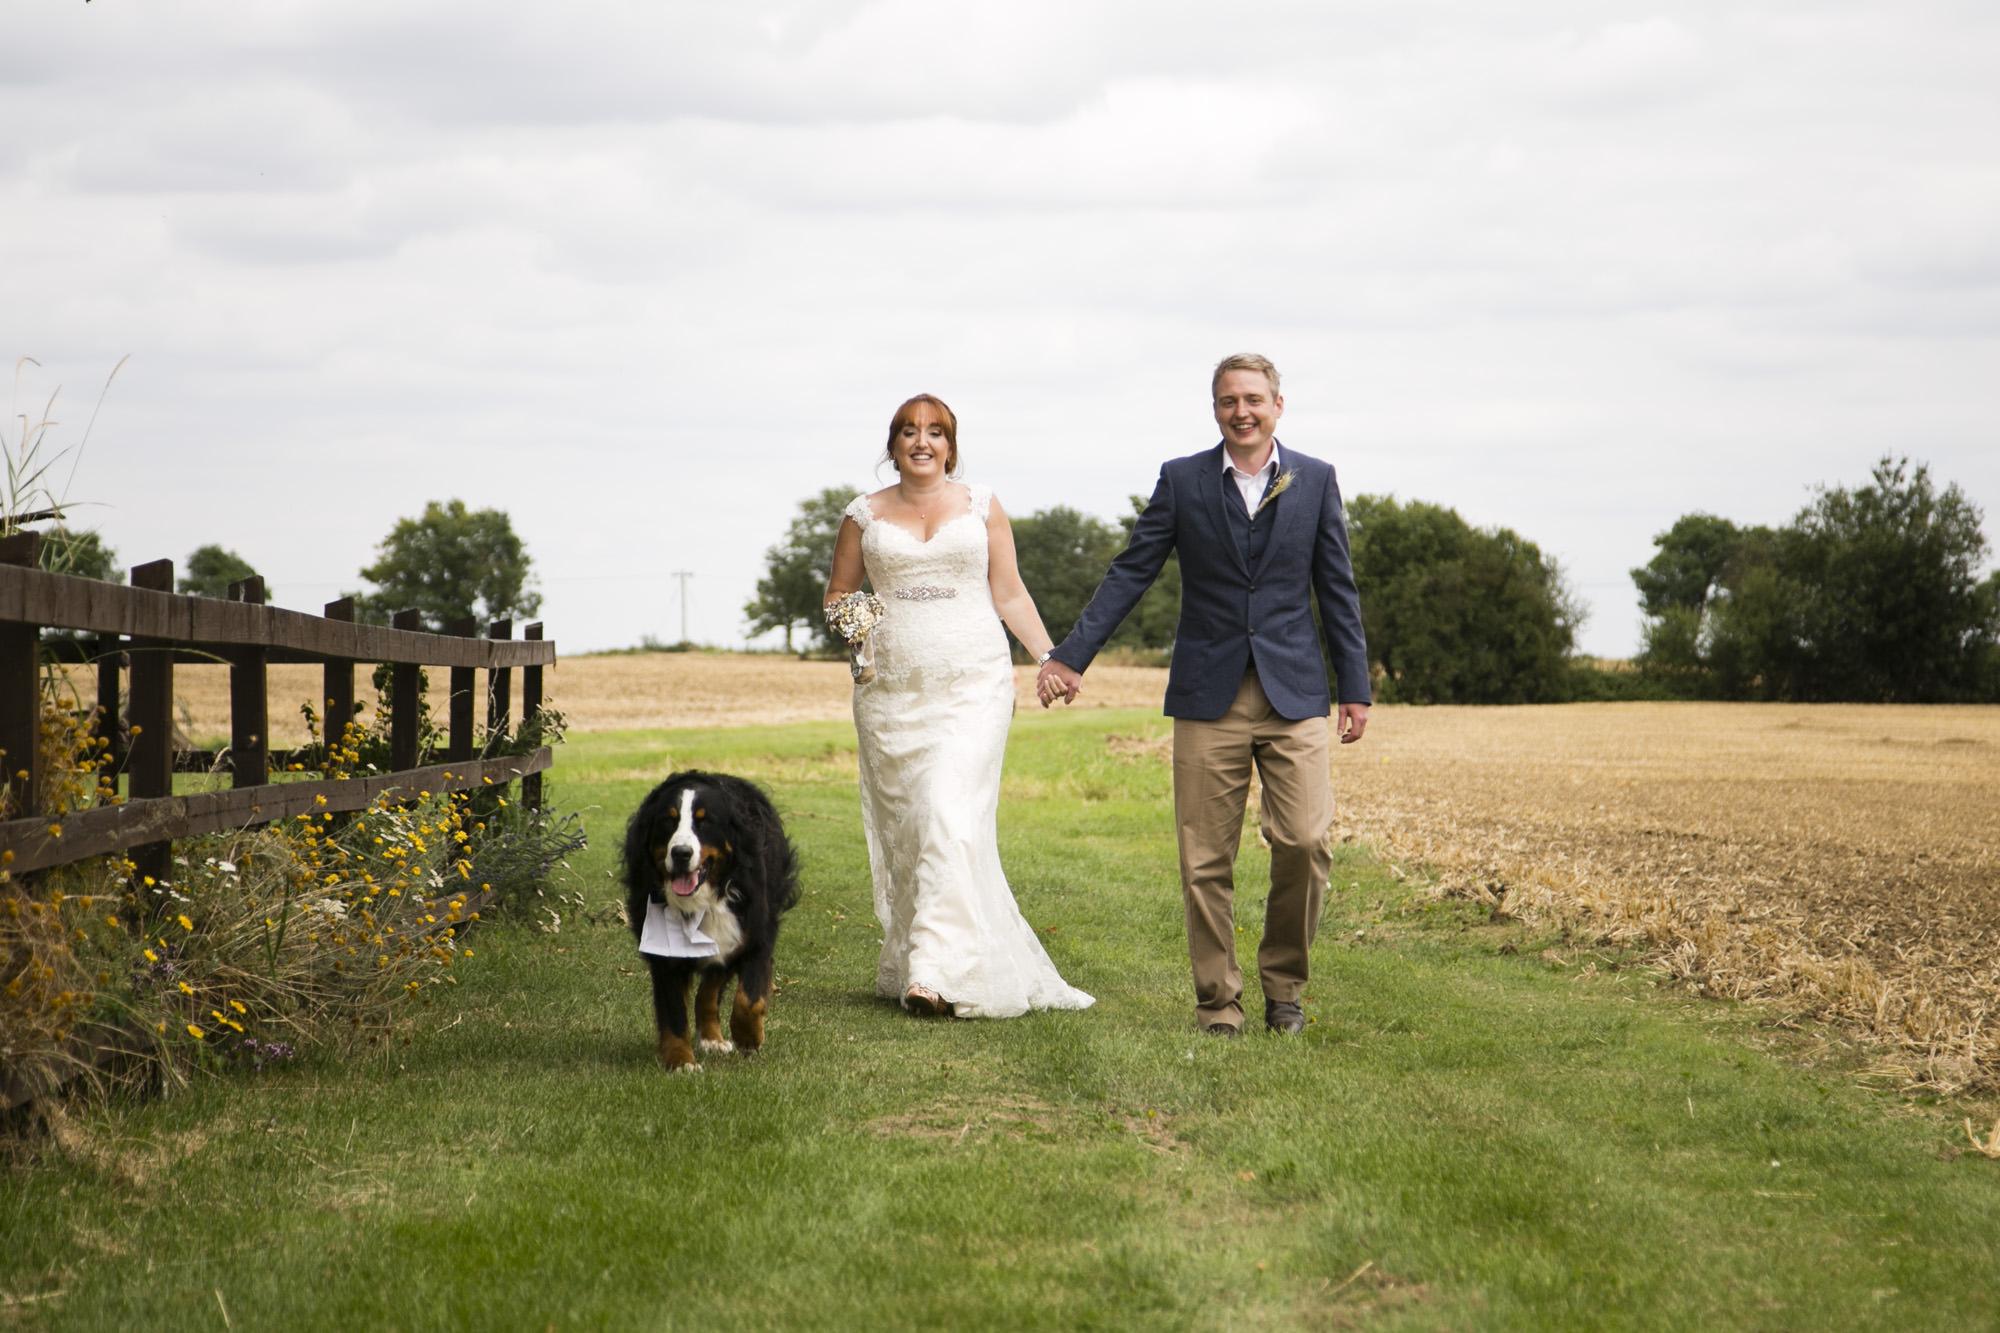 cambridge-wedding-photographer-io-1698-240.jpg